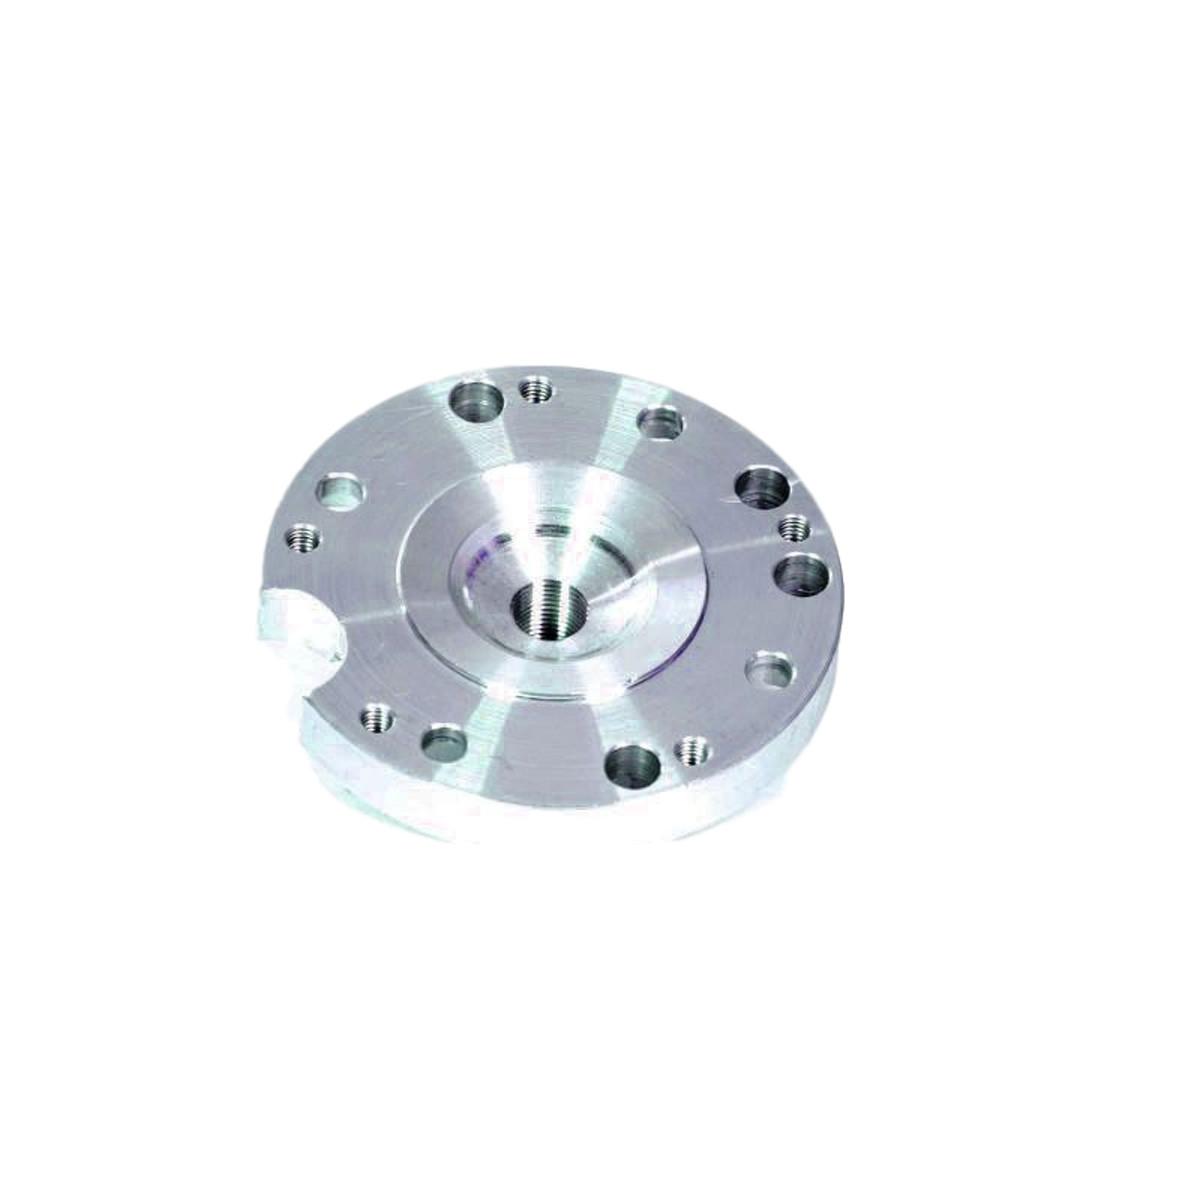 Plot de Culasse AM6 50mm - MVT